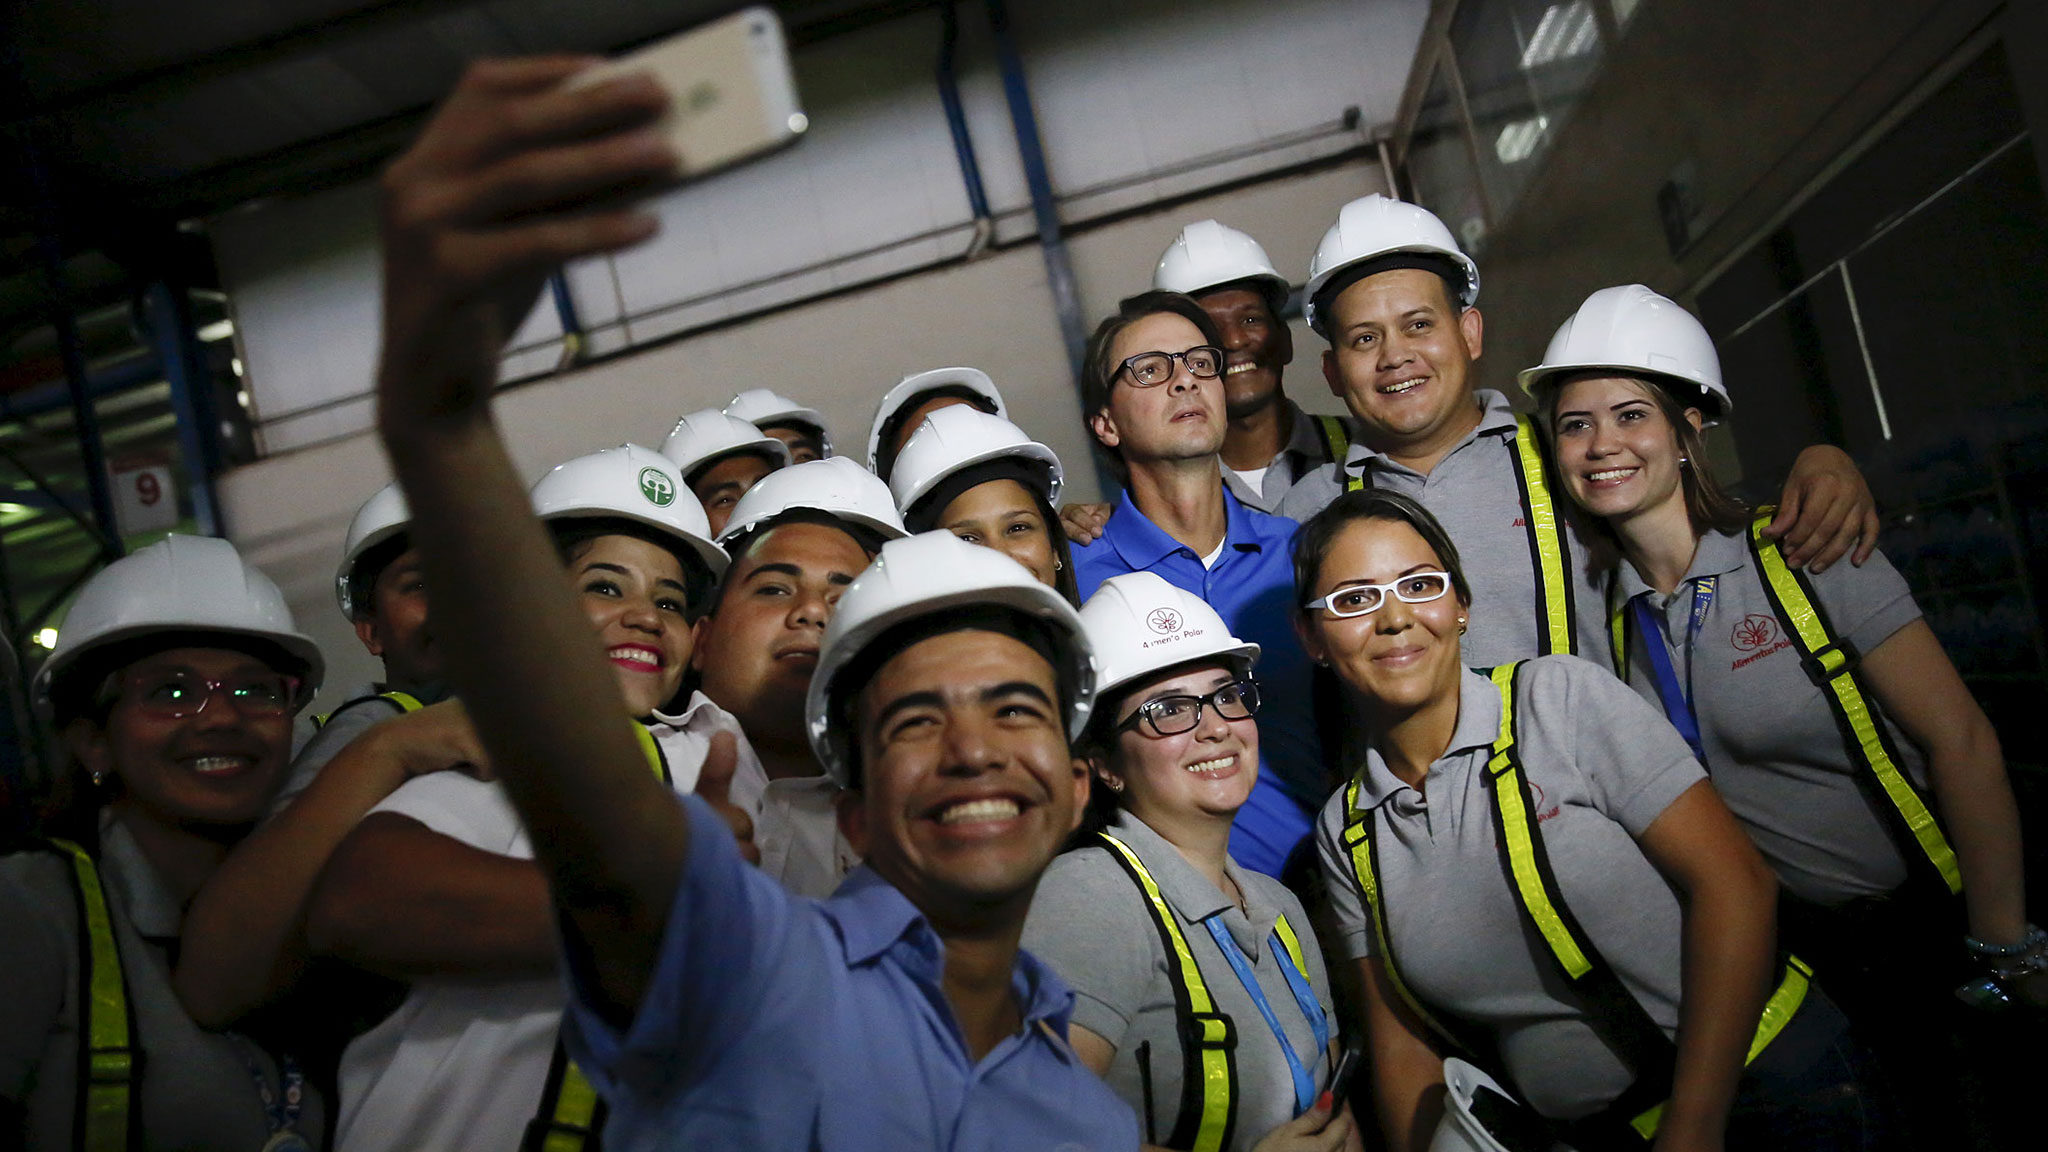 Empresas Polar: a symbol of resistance amid Venezuela crisis